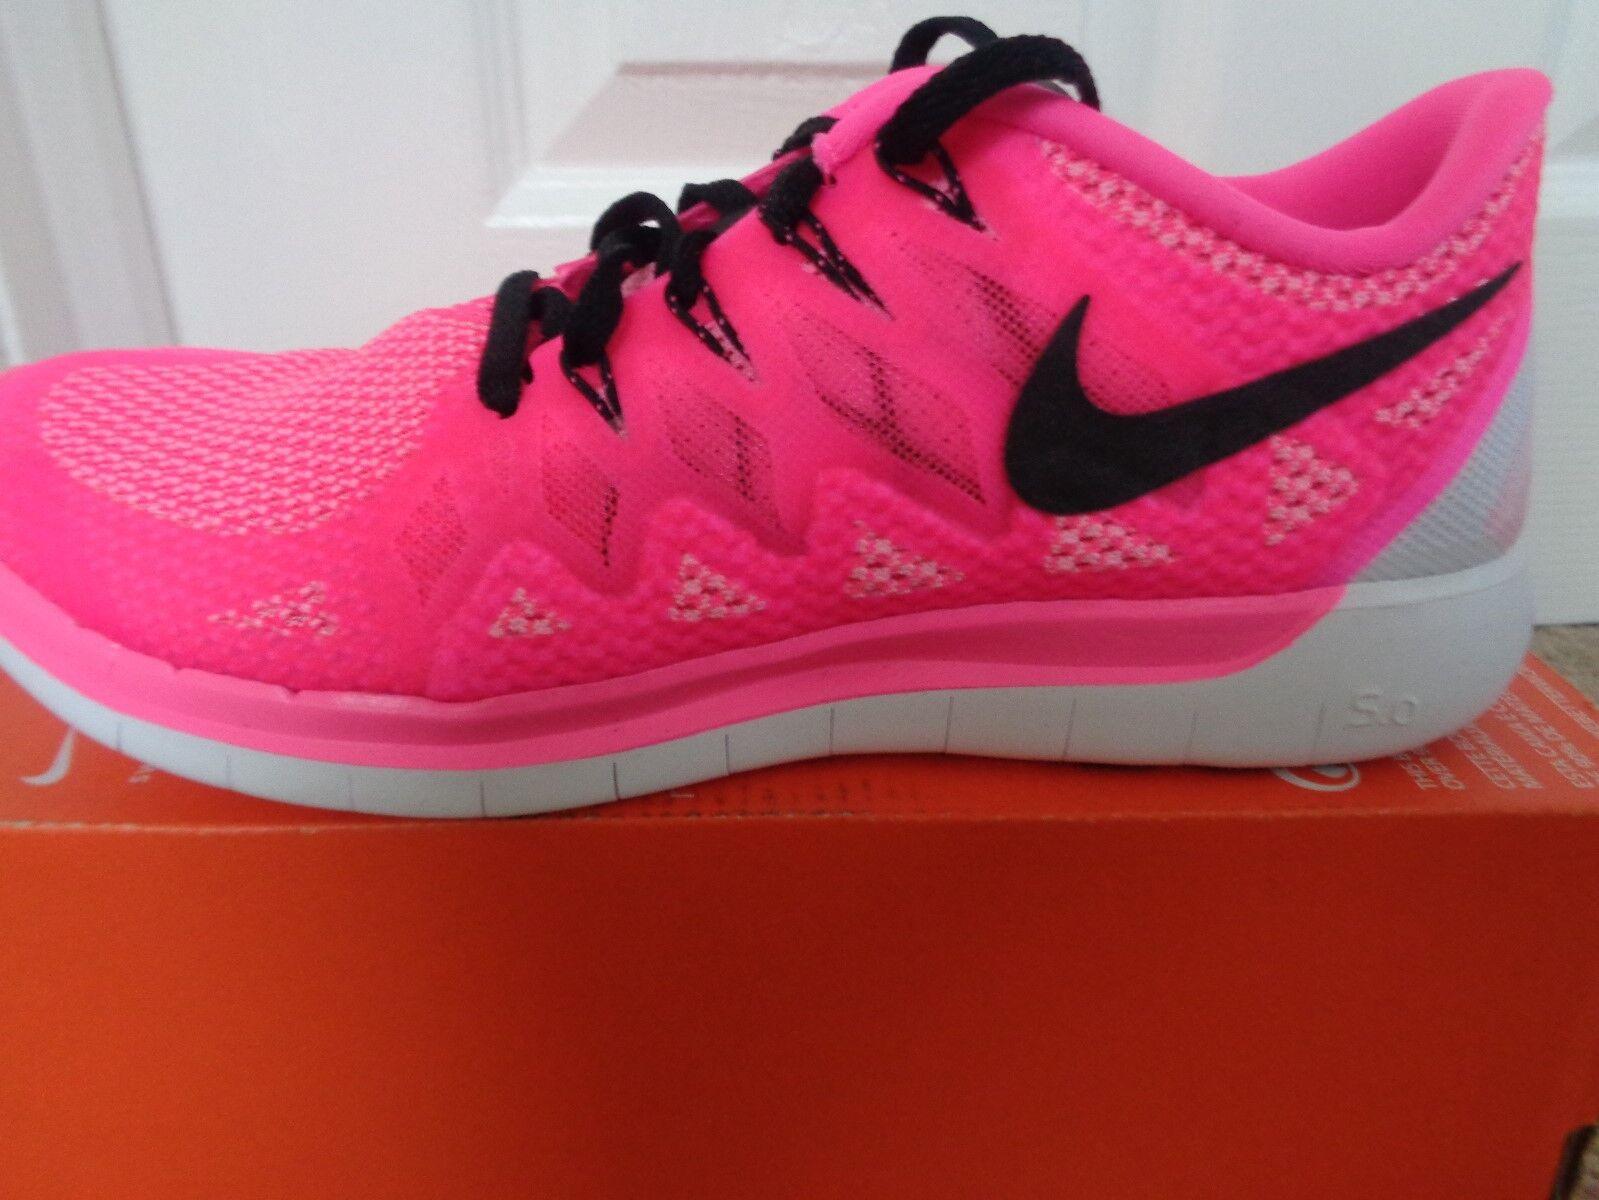 Nike Free 5.0 Para Mujer Zapatos Zapatillas Zapatillas Zapatillas zapatillas 642199 603 UK 5 EU 38.5 nos 7.5 Nuevo  Tienda 2018